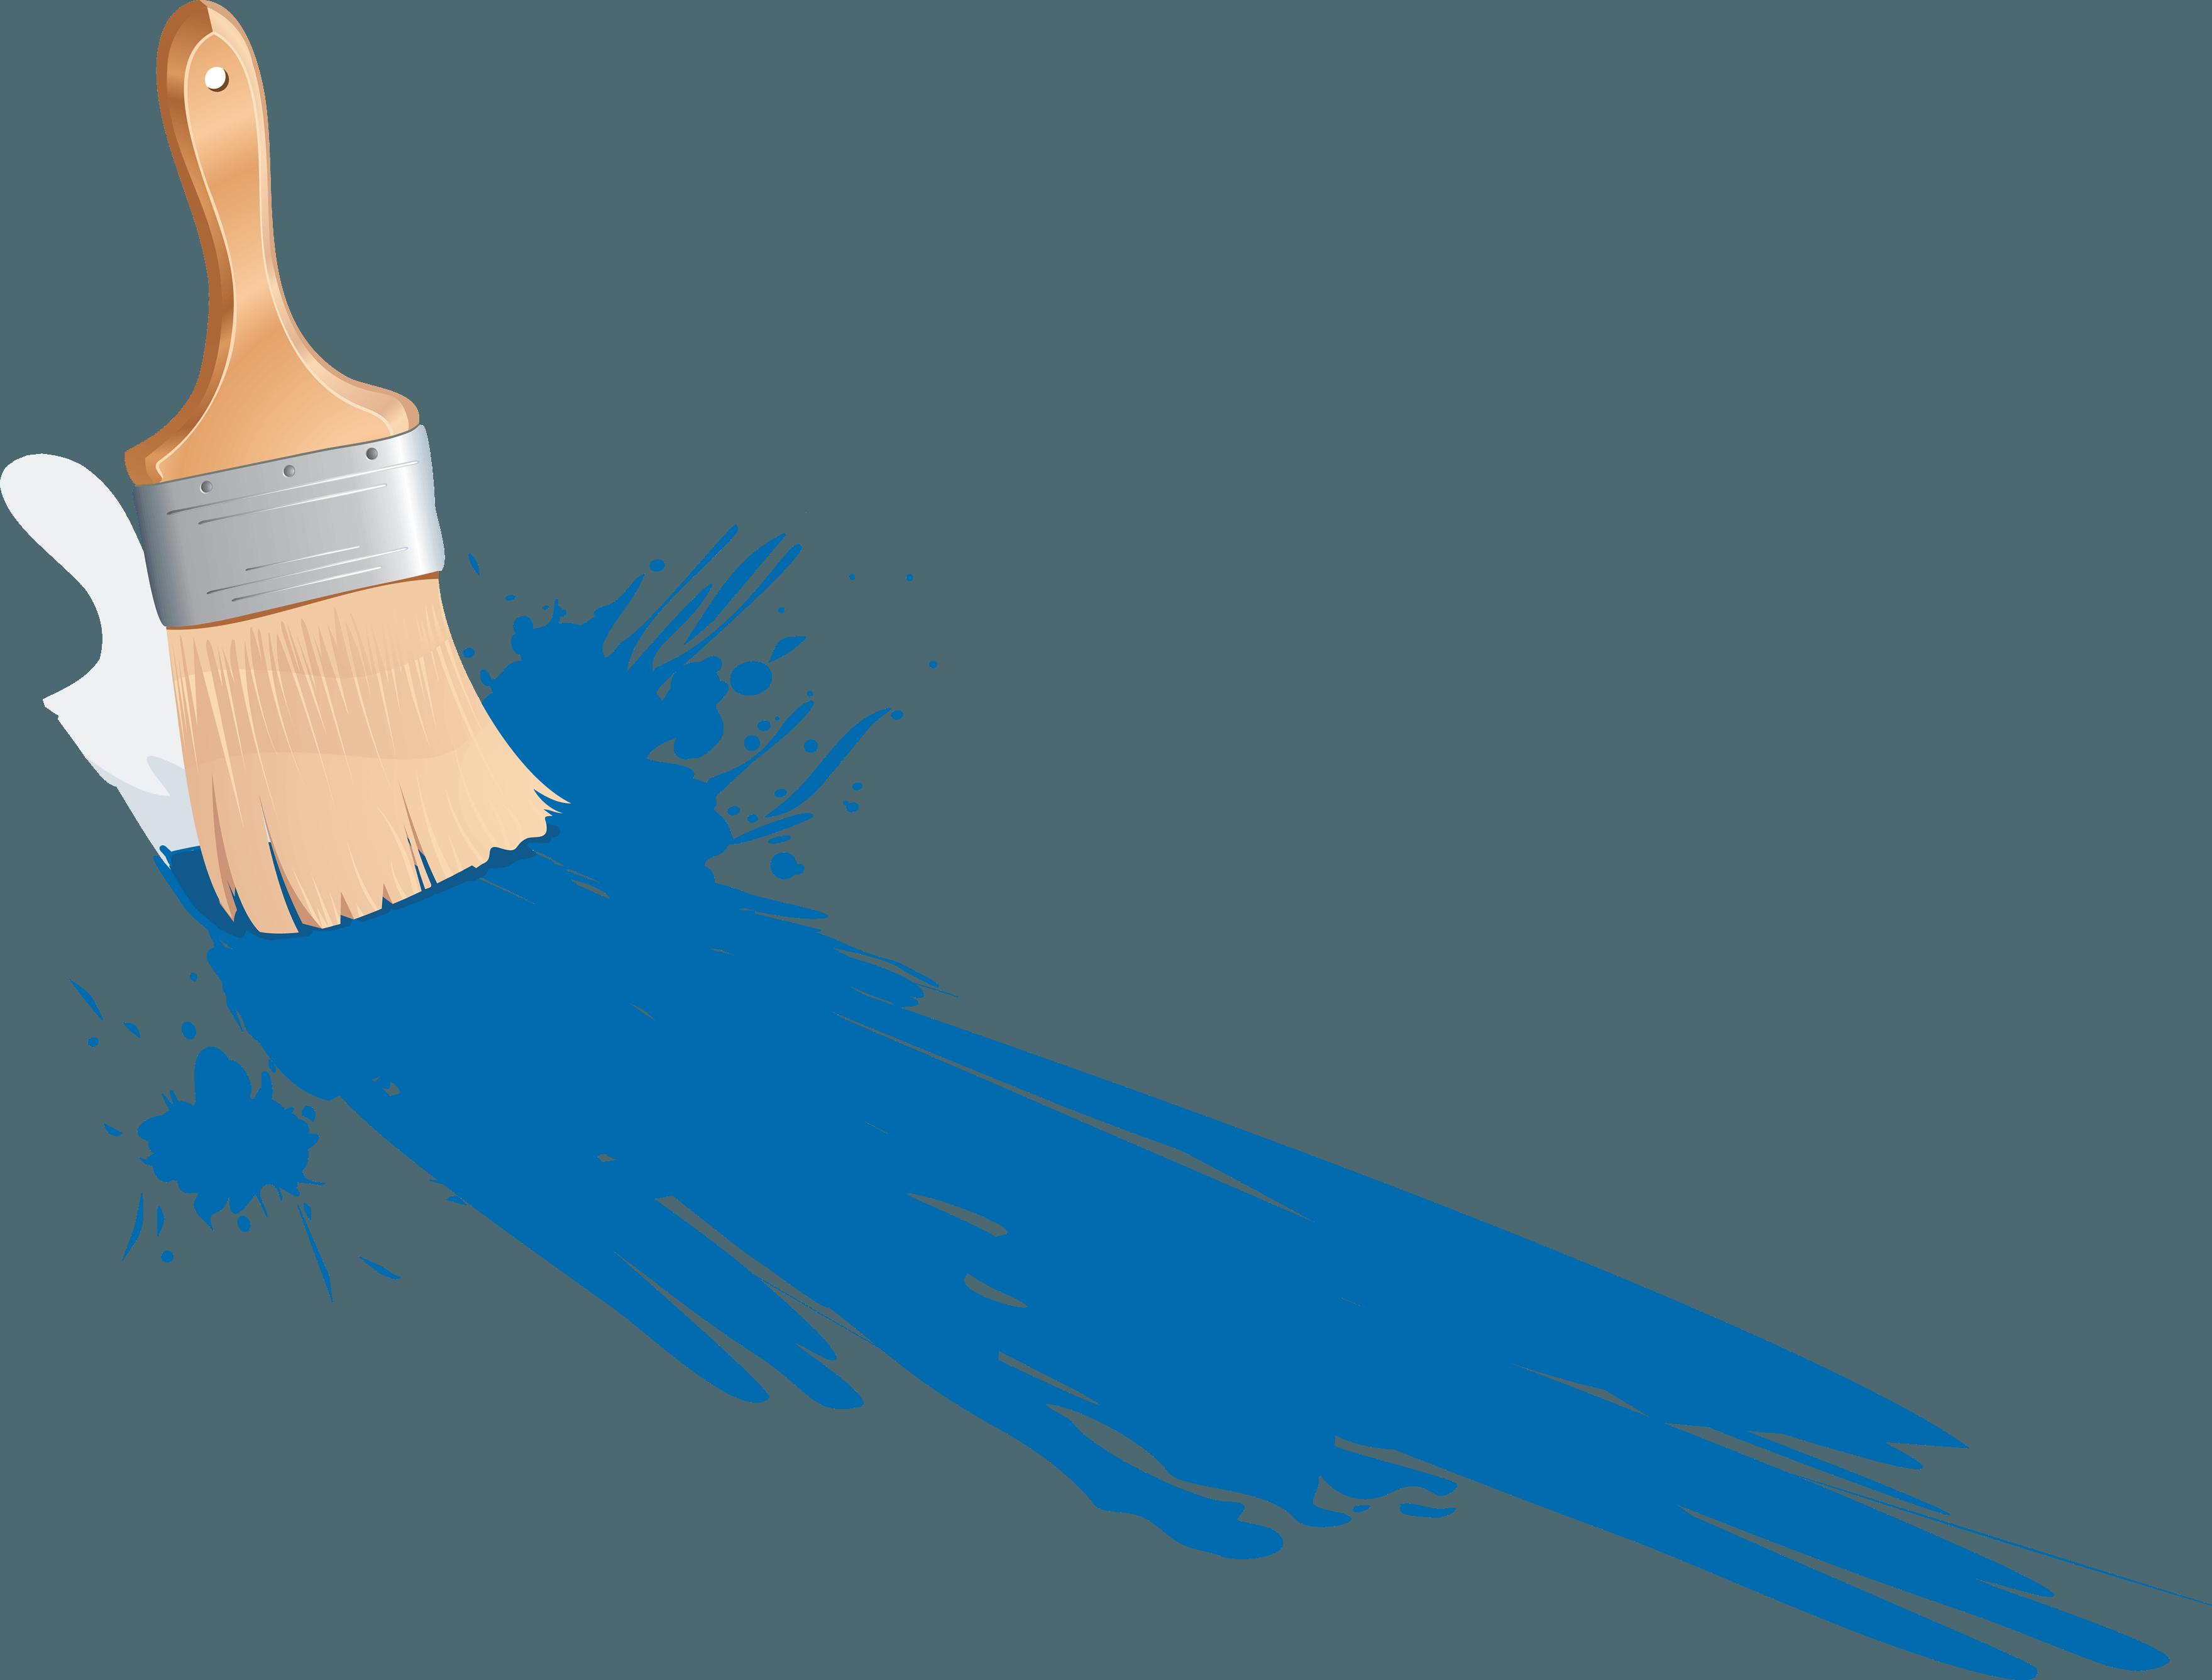 Brush Microsoft Paint Paint.net Layers.